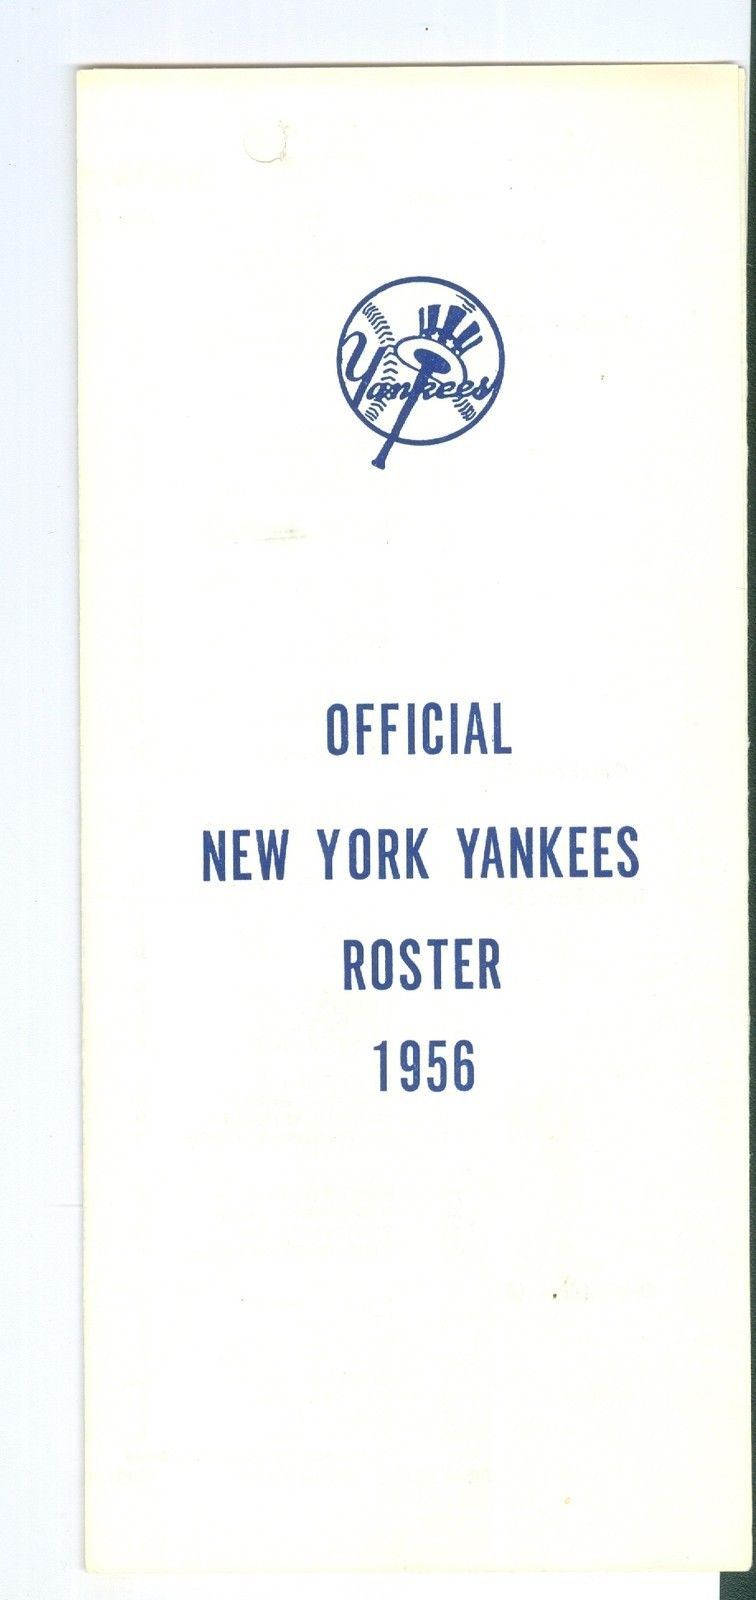 1956 New York Yankees spring training roster